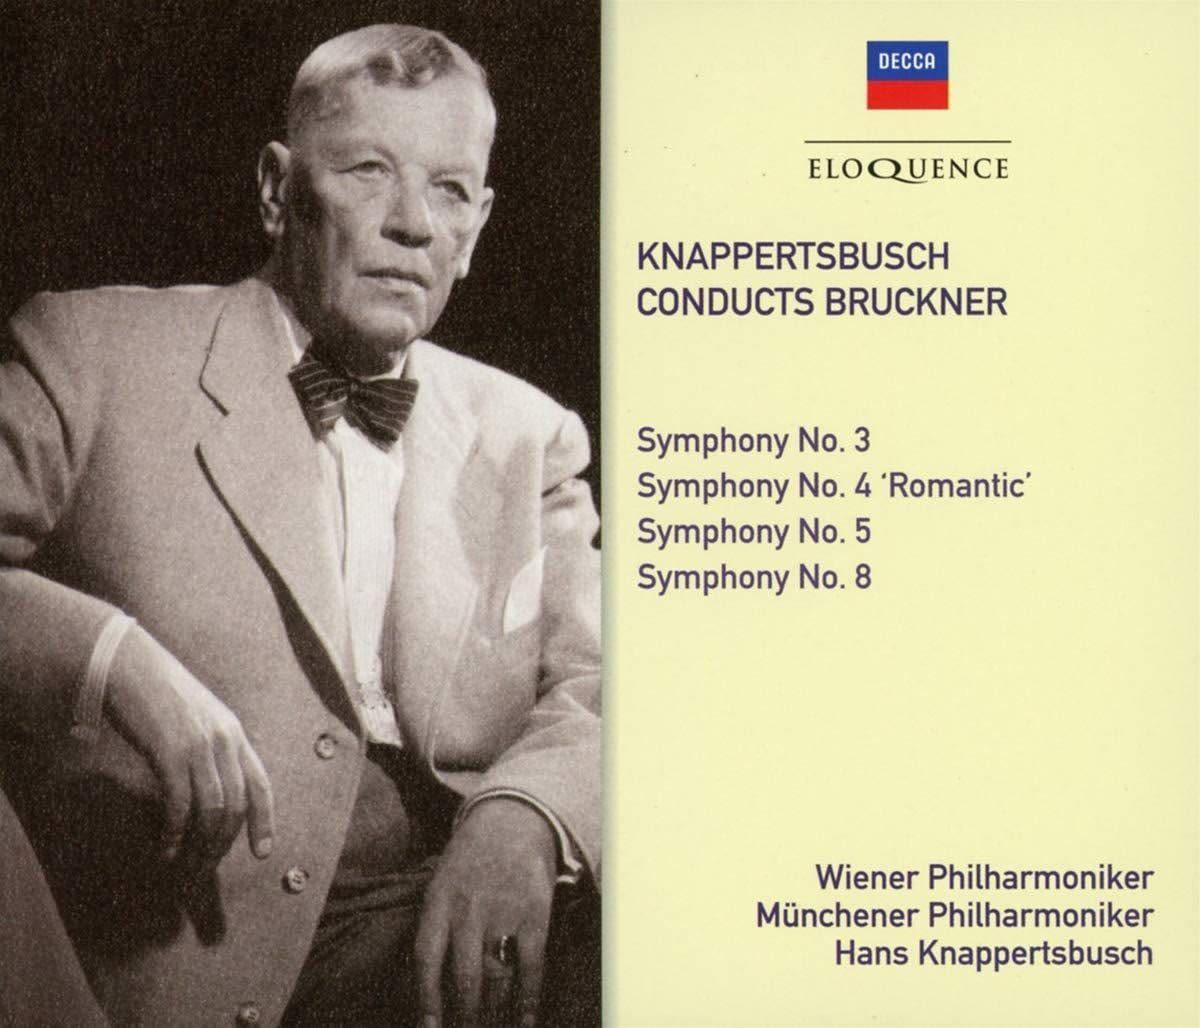 Photo No.1 of Hans Knappertsbusch – The Decca & Westminster Bruckner Recordings